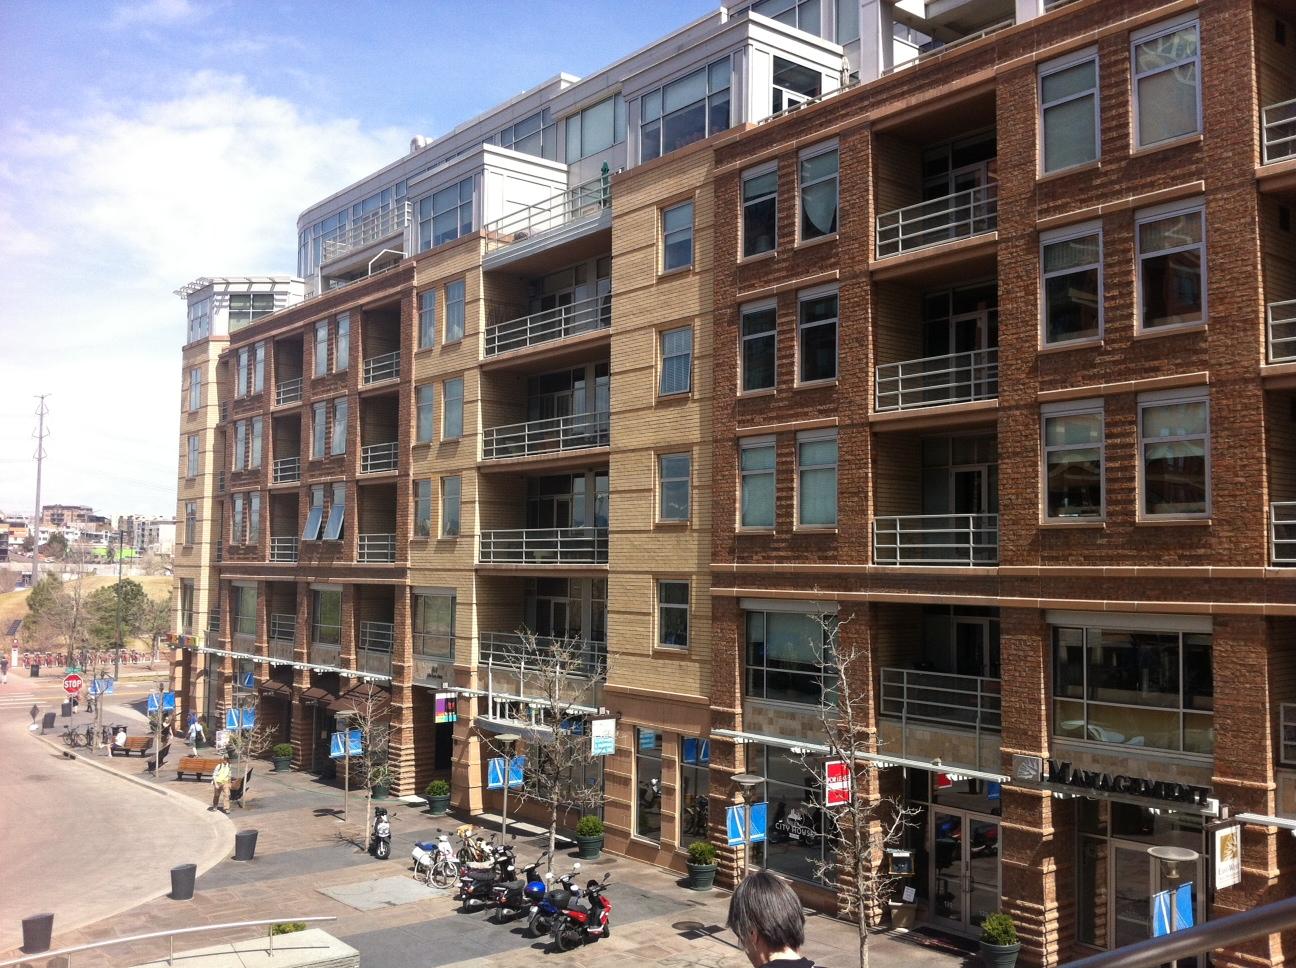 Condo block in Denver's LoDo districtcould easily fit into Calgary'sBridgeland or Kensington communities.